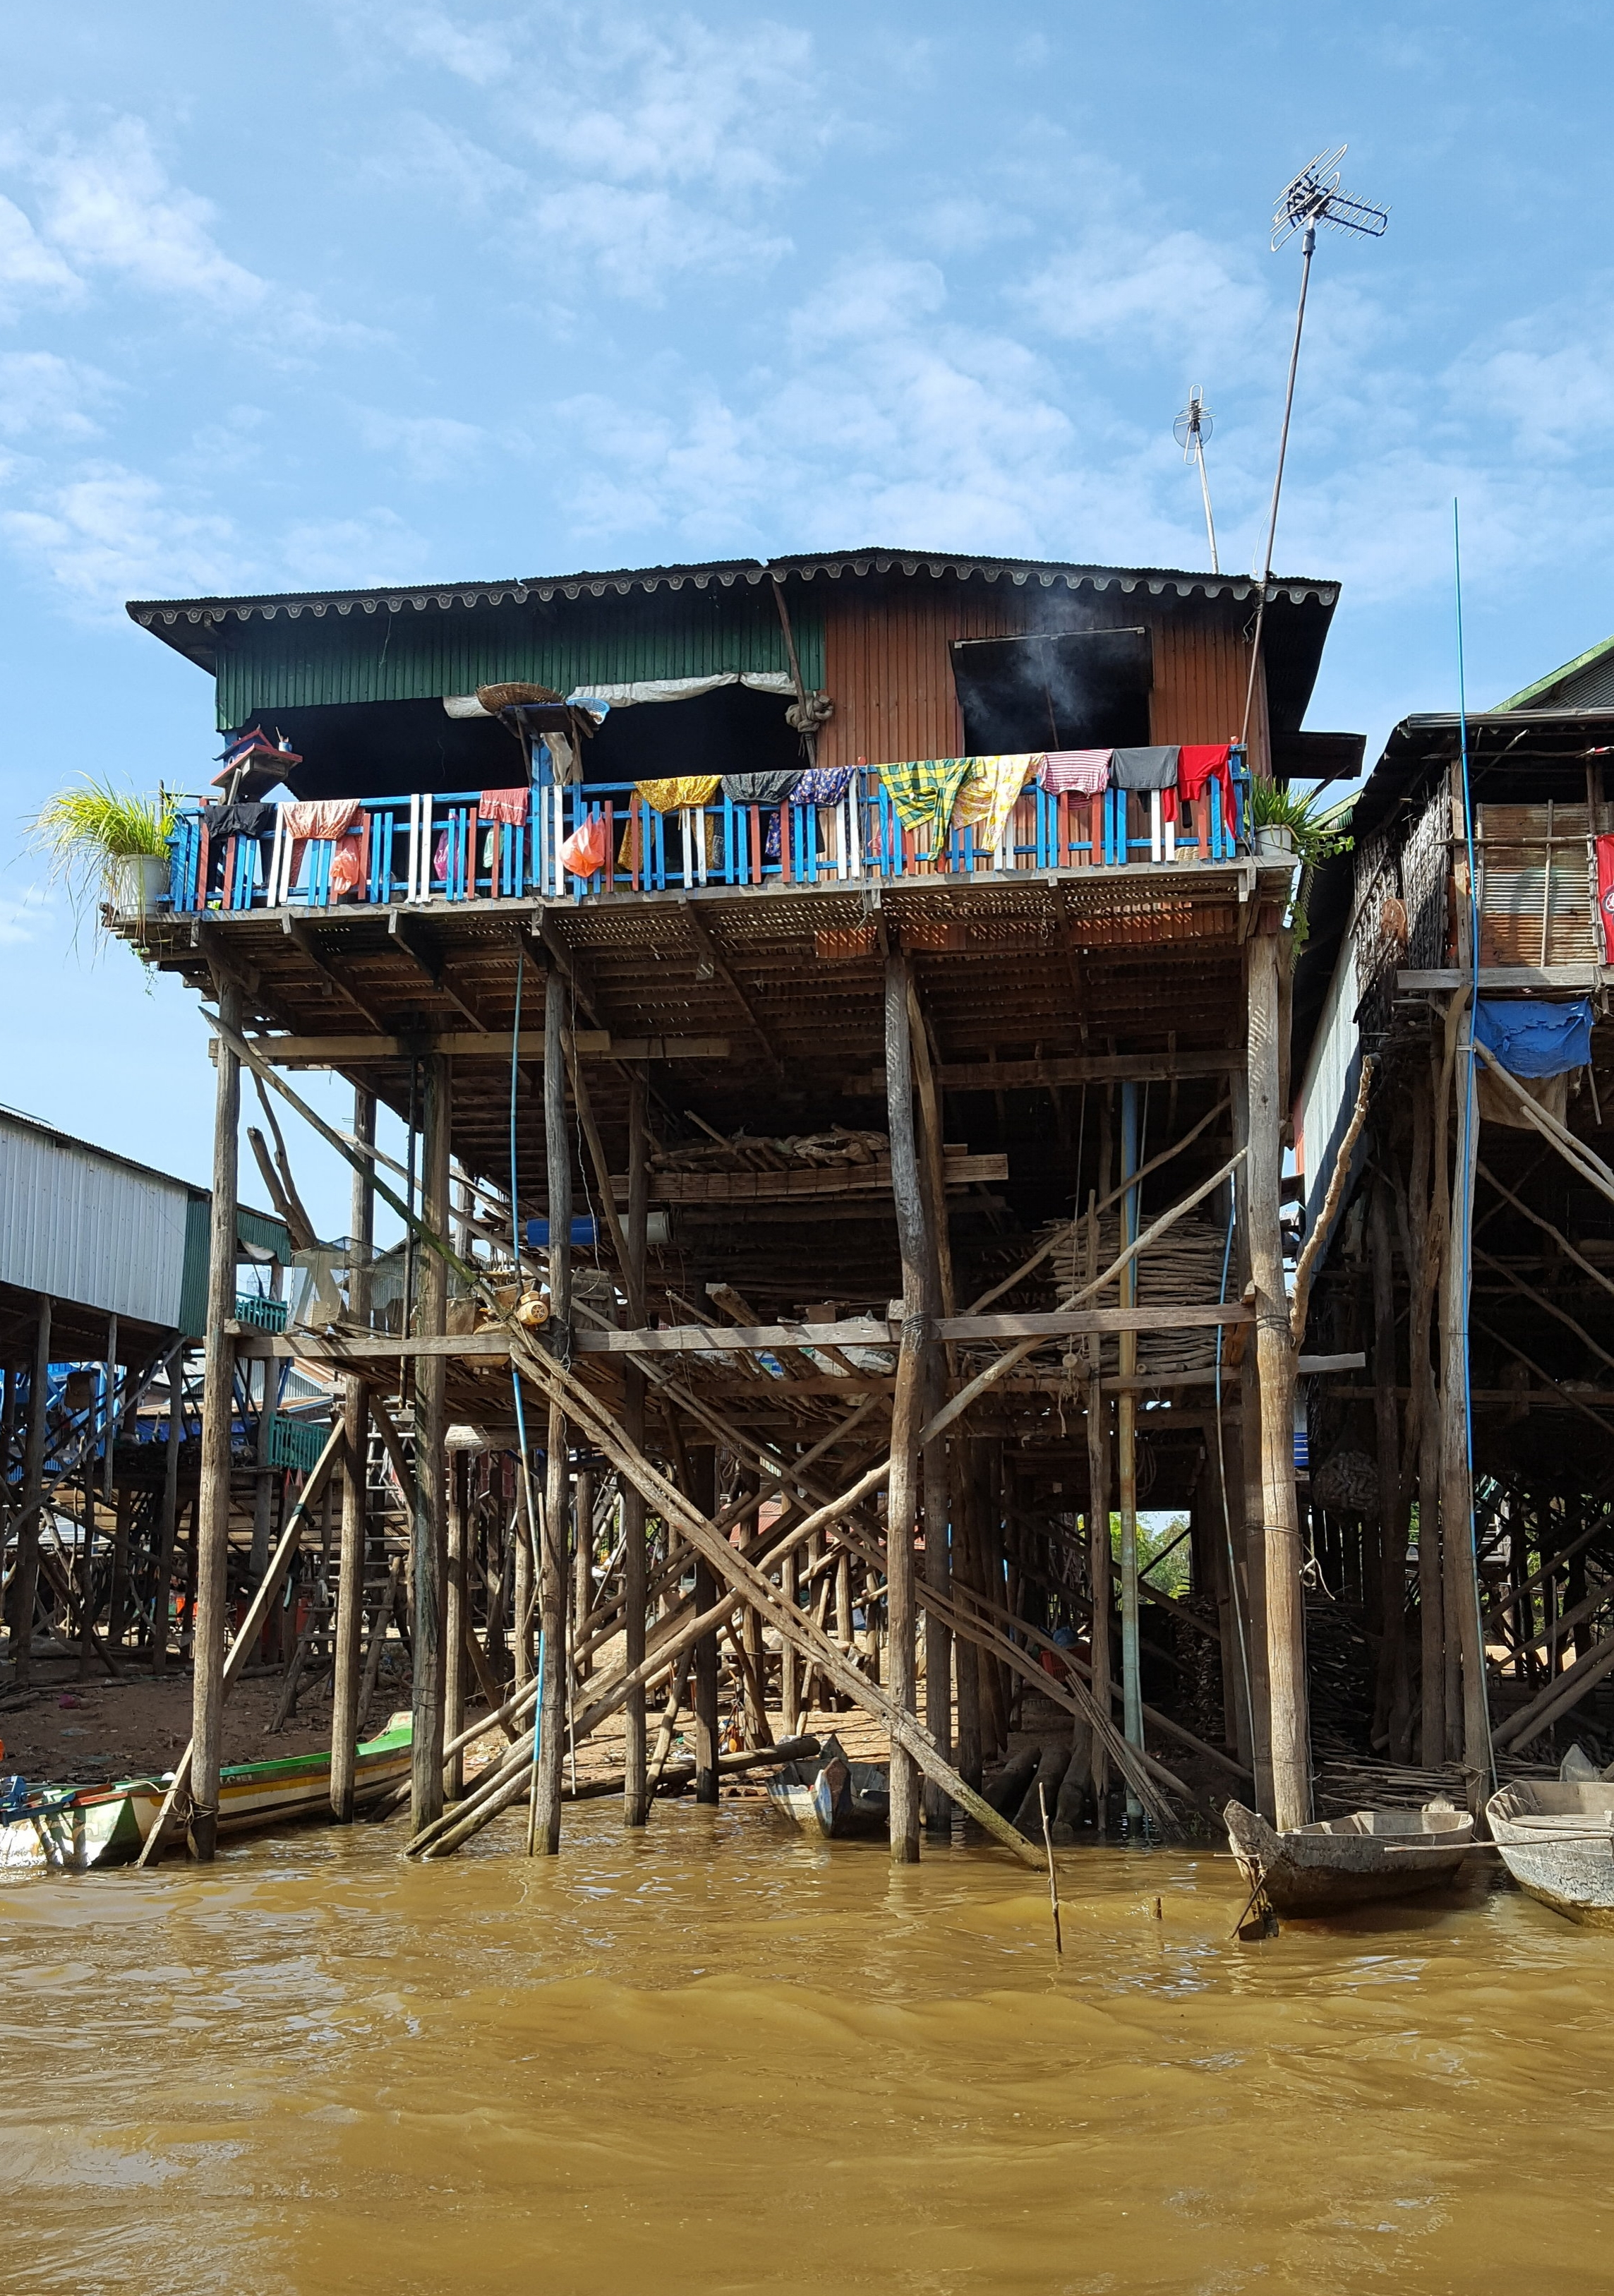 House at Kompong Khleang floating village